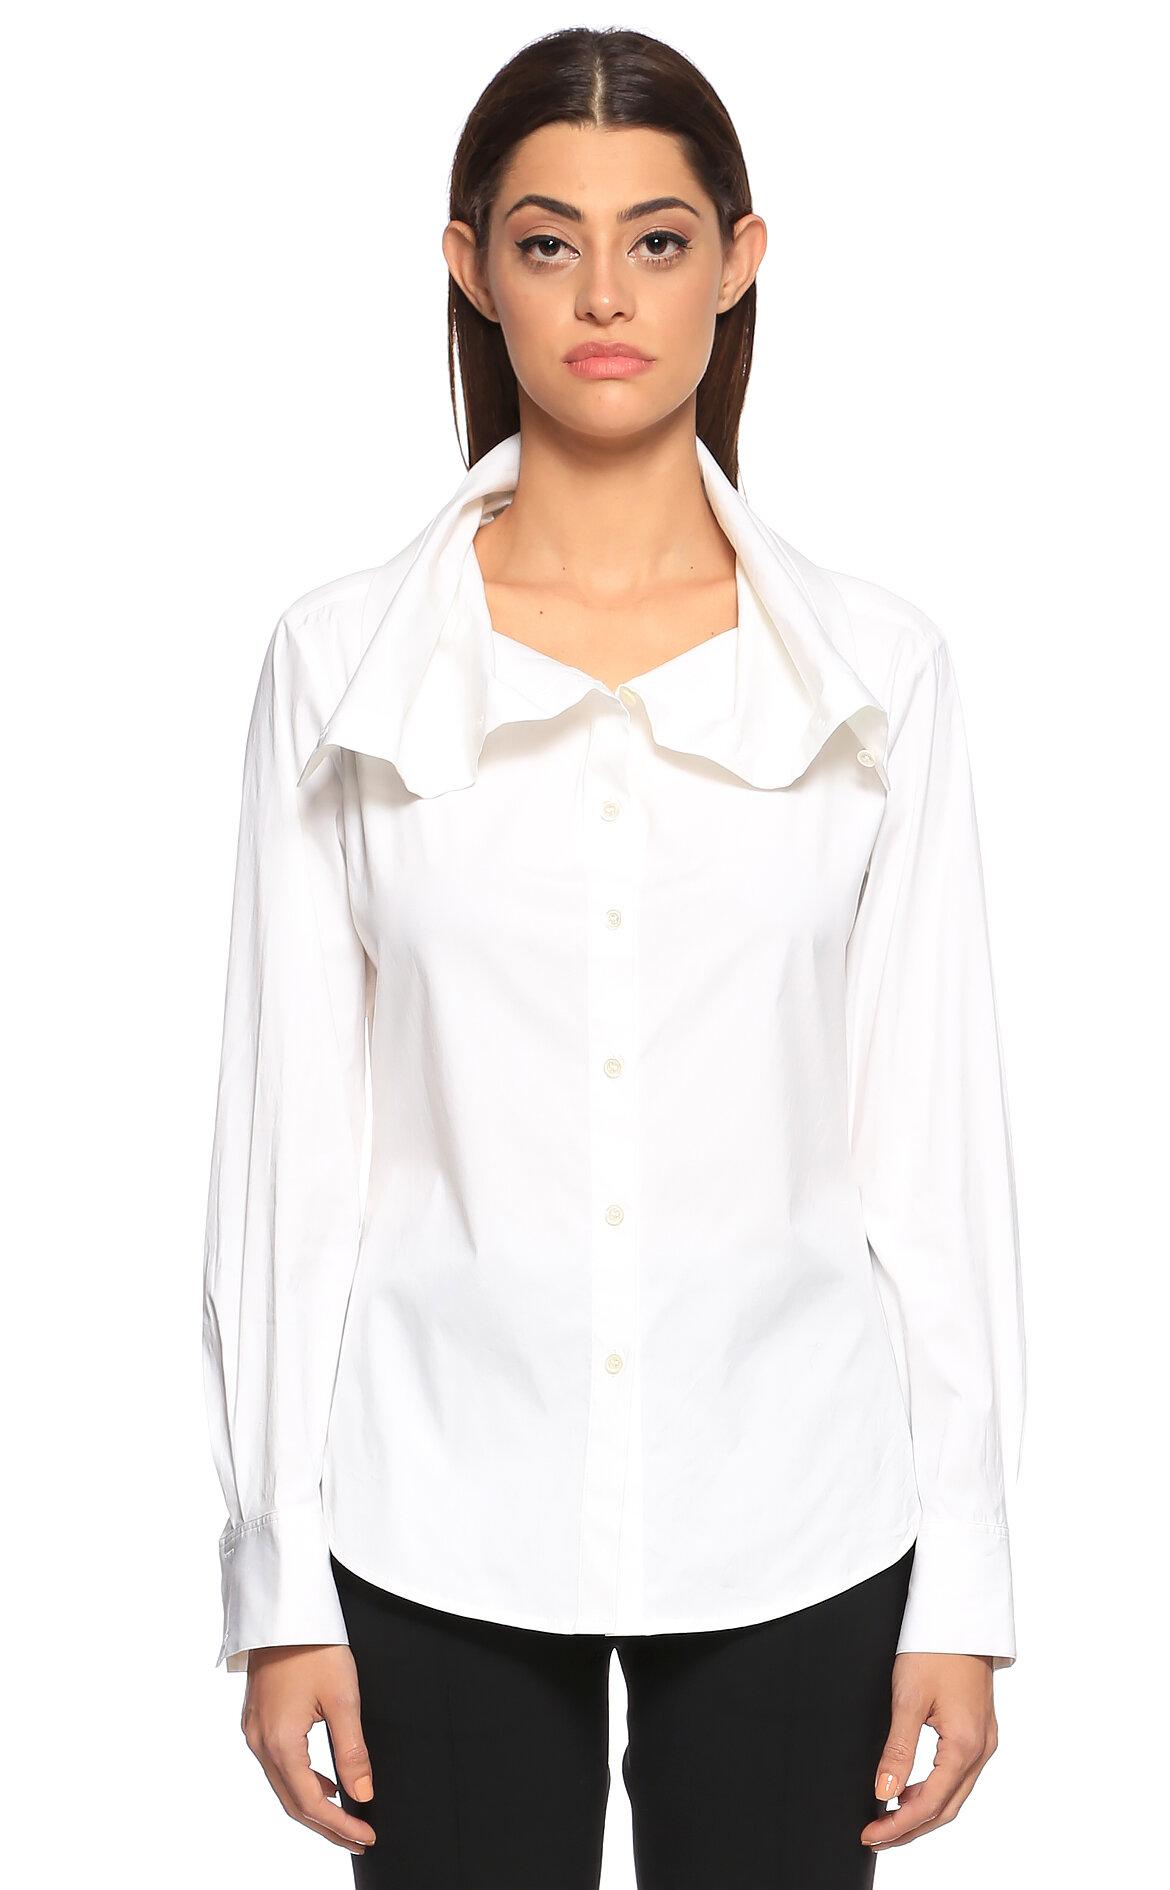 Theory-Theory Şal Yaka Beyaz Gömlek